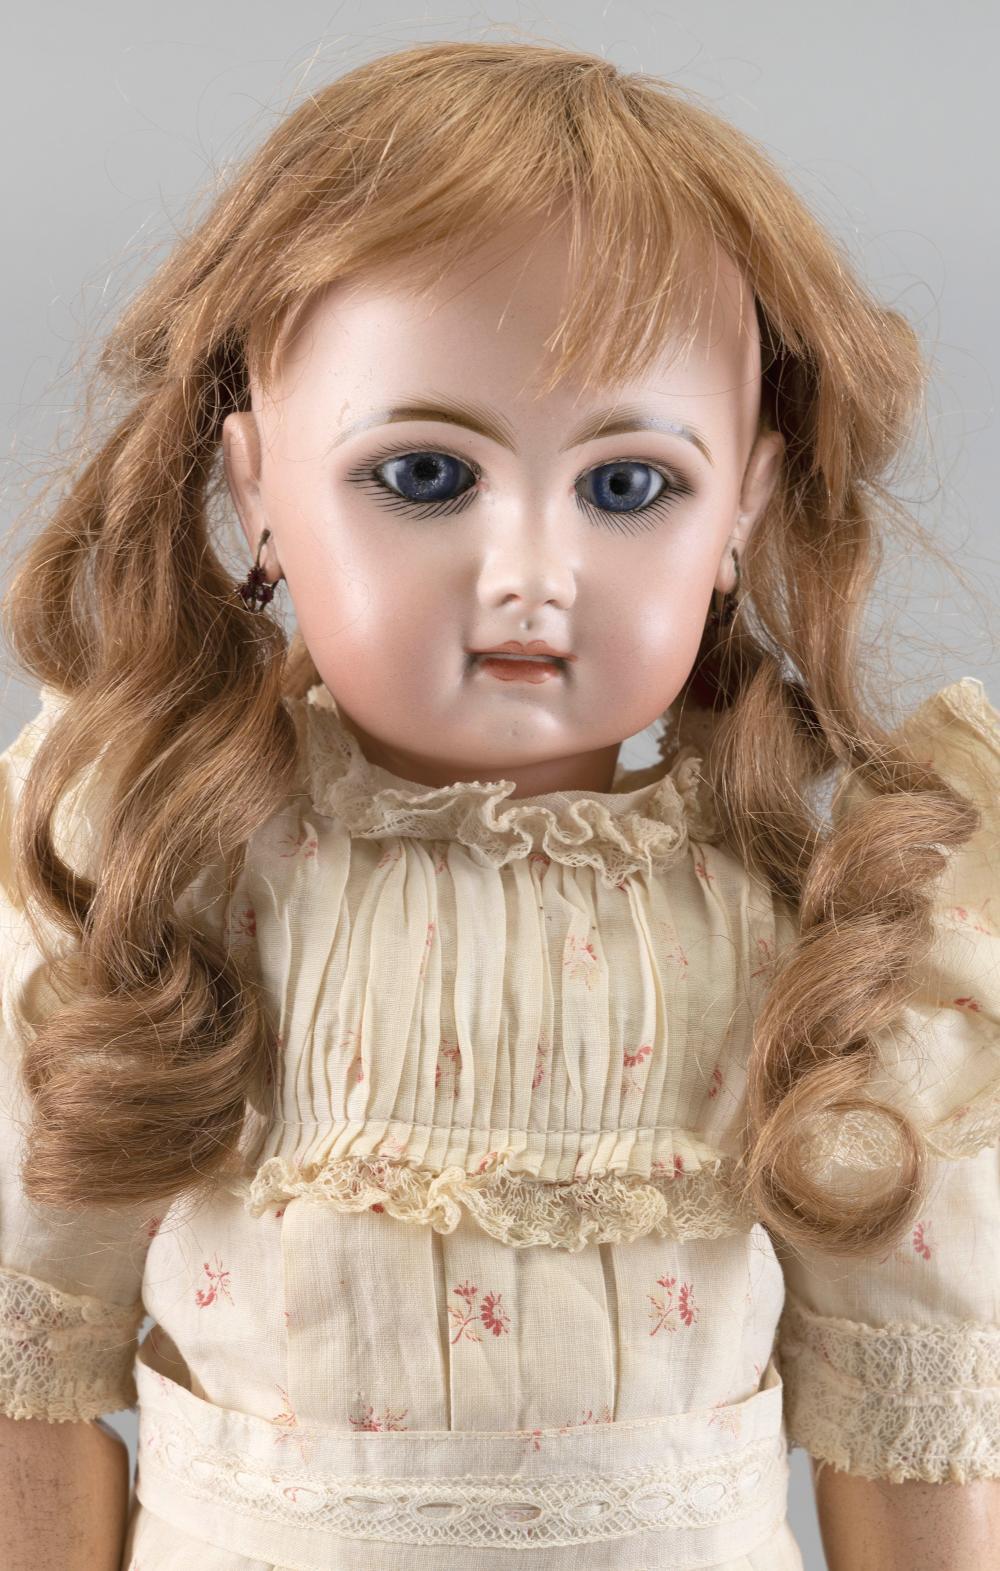 FRENCH JUMEAU BISQUE-HEAD DOLL Circa 1890 Height 22